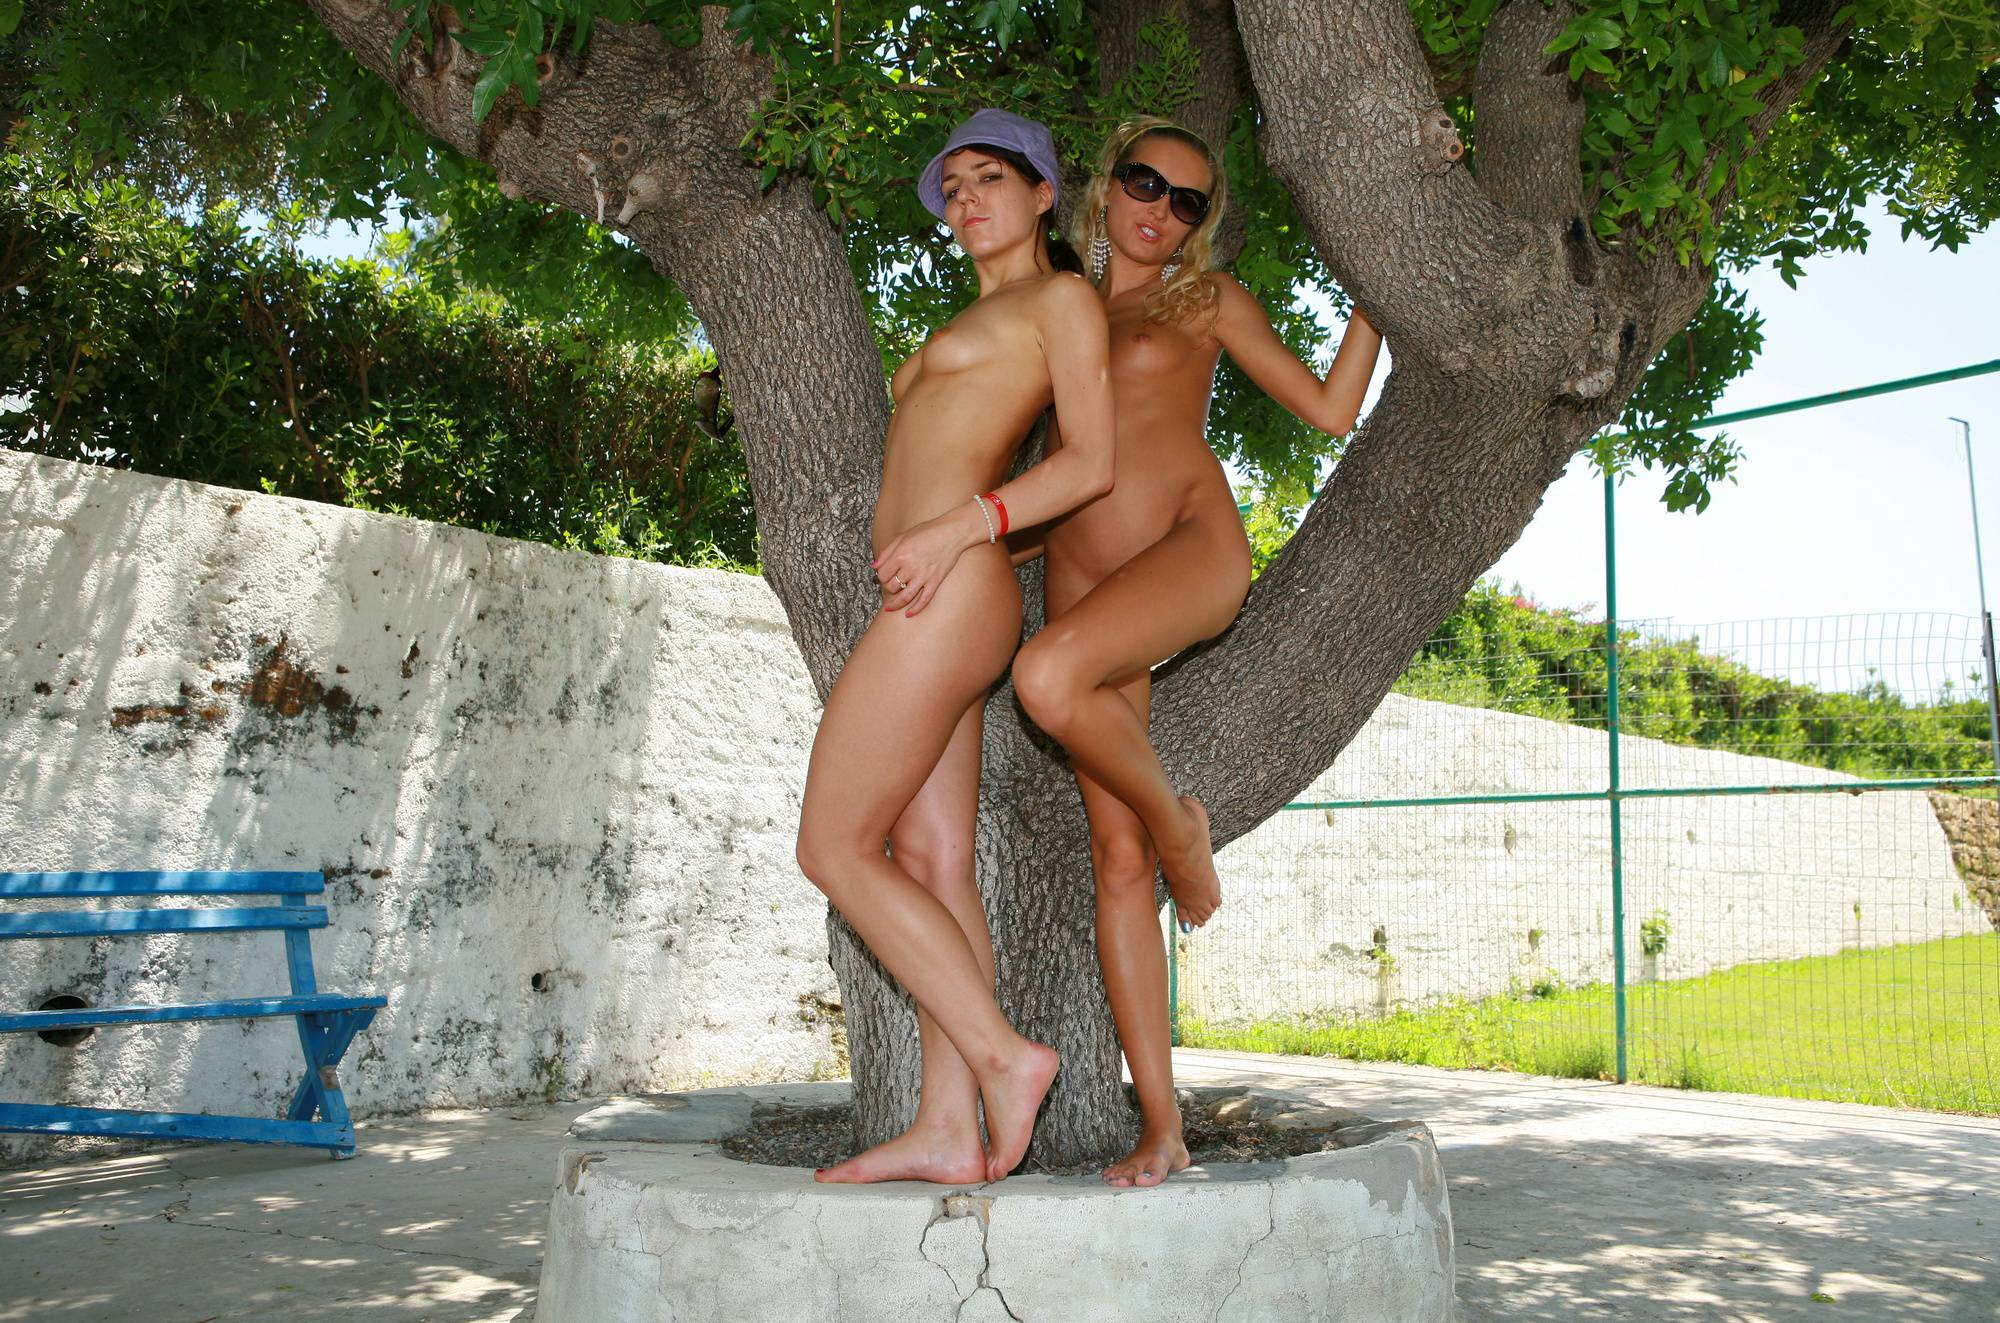 Greek Tree Exploring Trio - 2